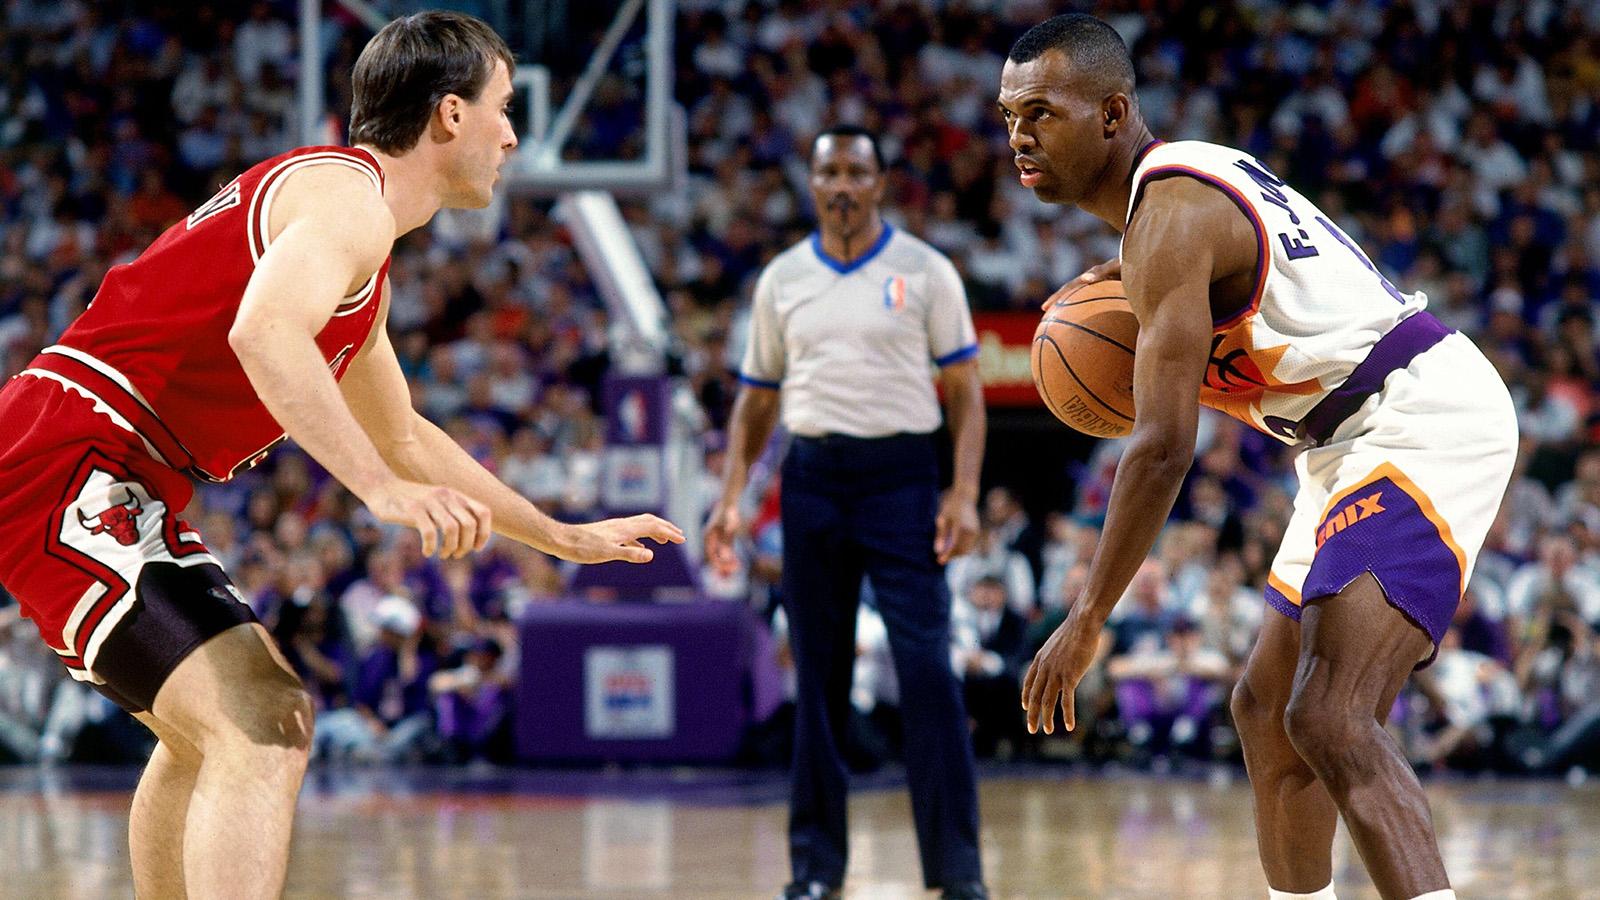 John Paxson playing defense